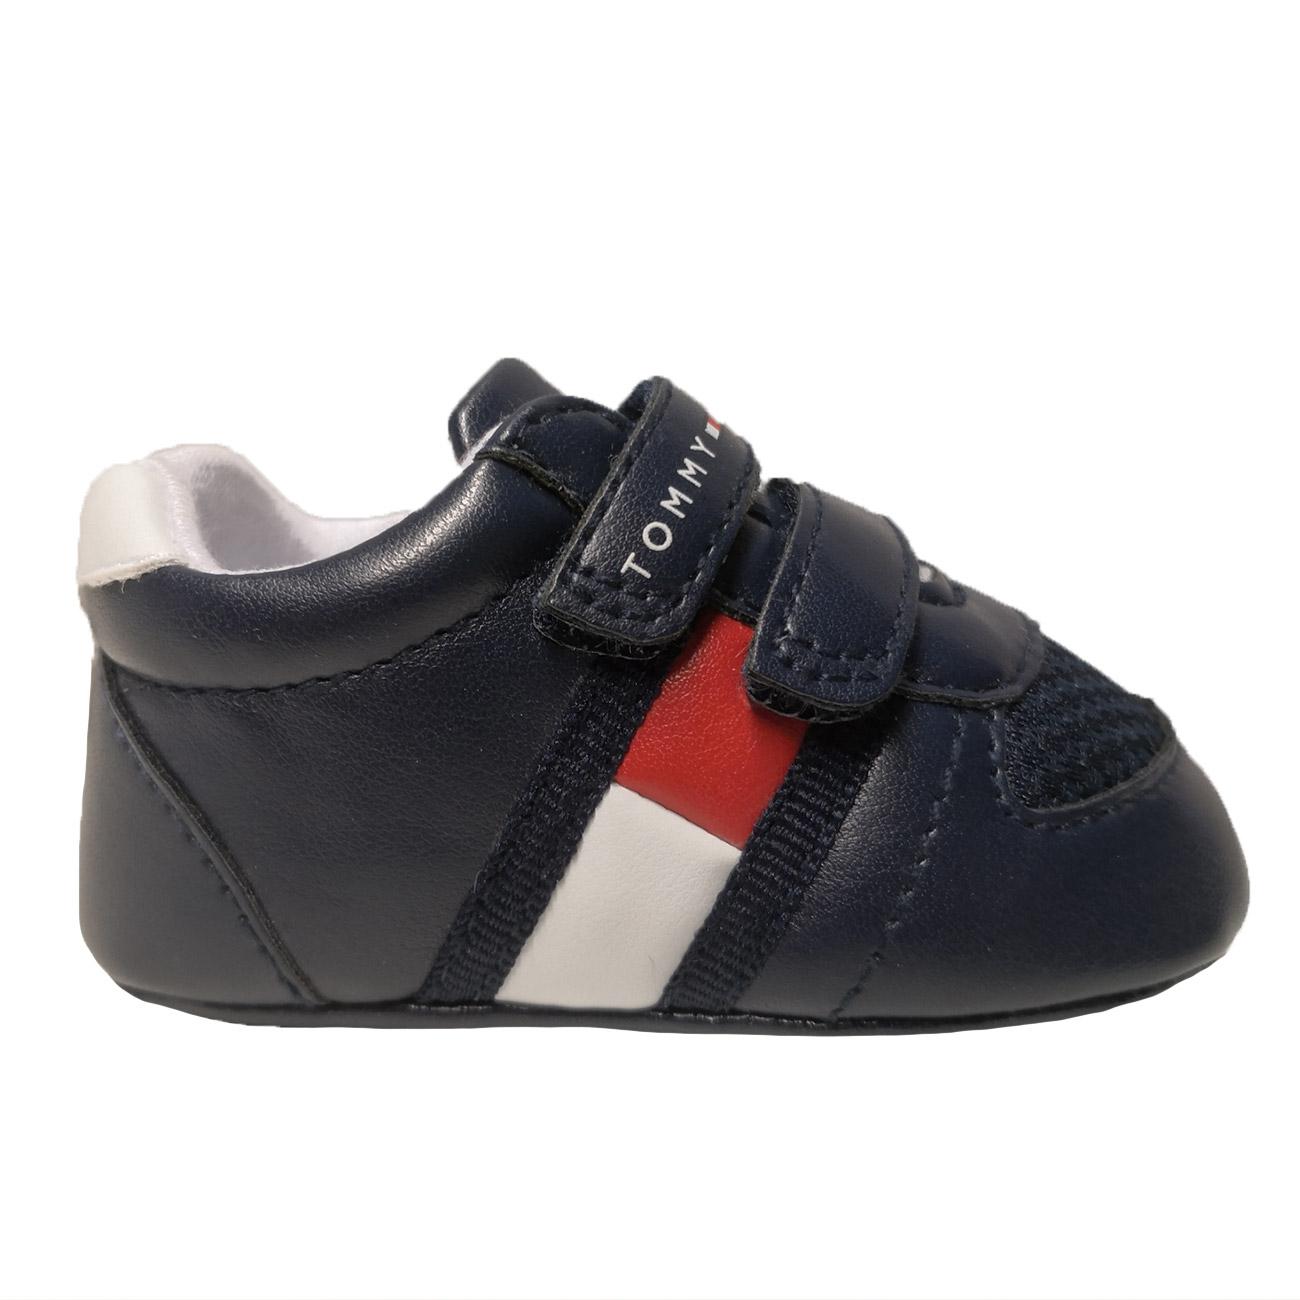 Tommy Hilfiger Lace-Up Shoe Blue/Bianco